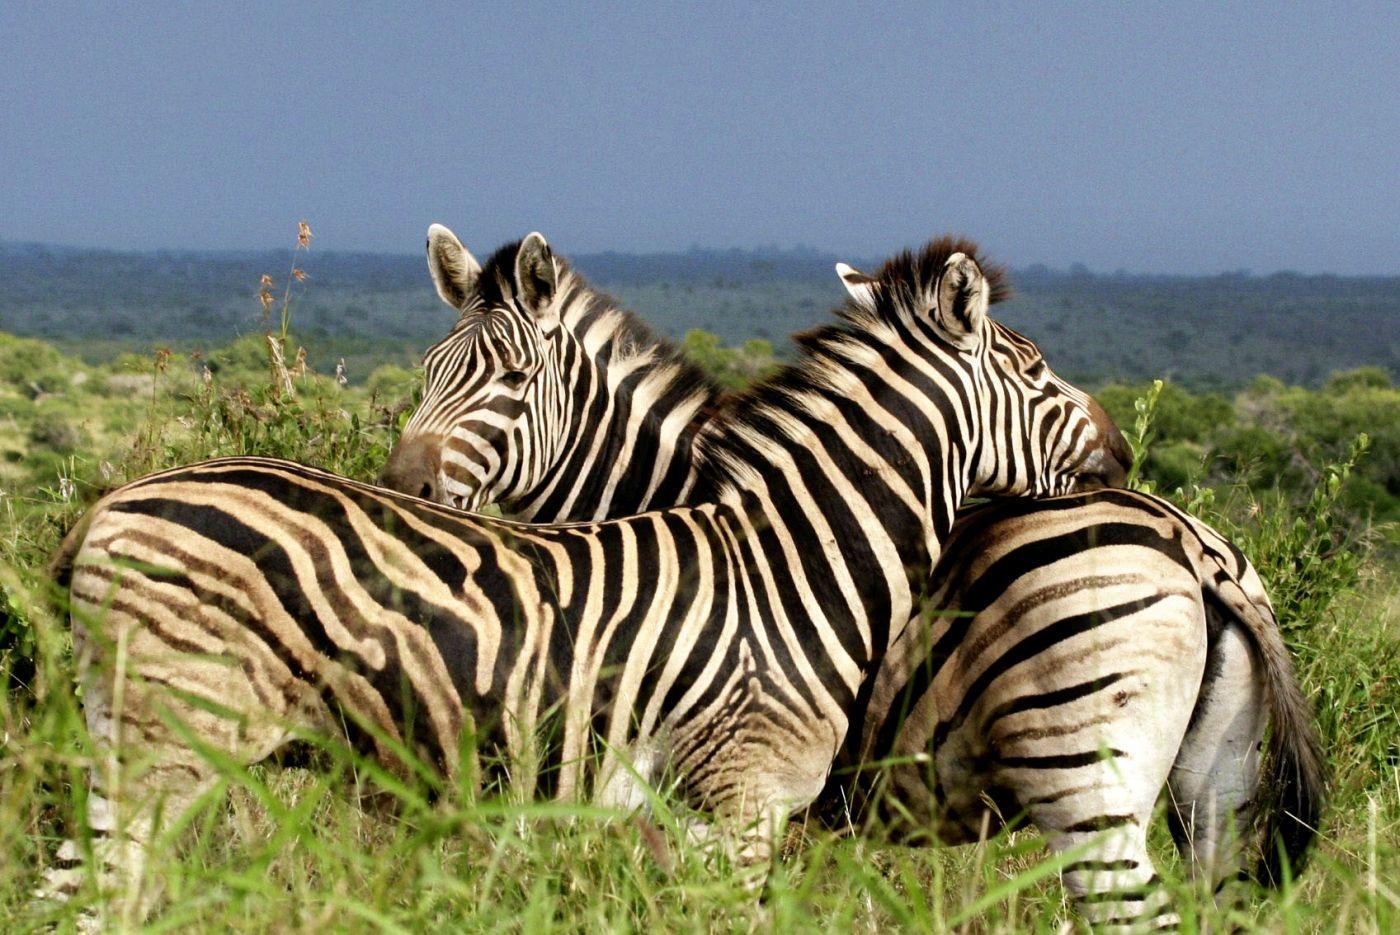 Zebras (c) Marco Polo Reisen GmbH _www dein-suedafrika de